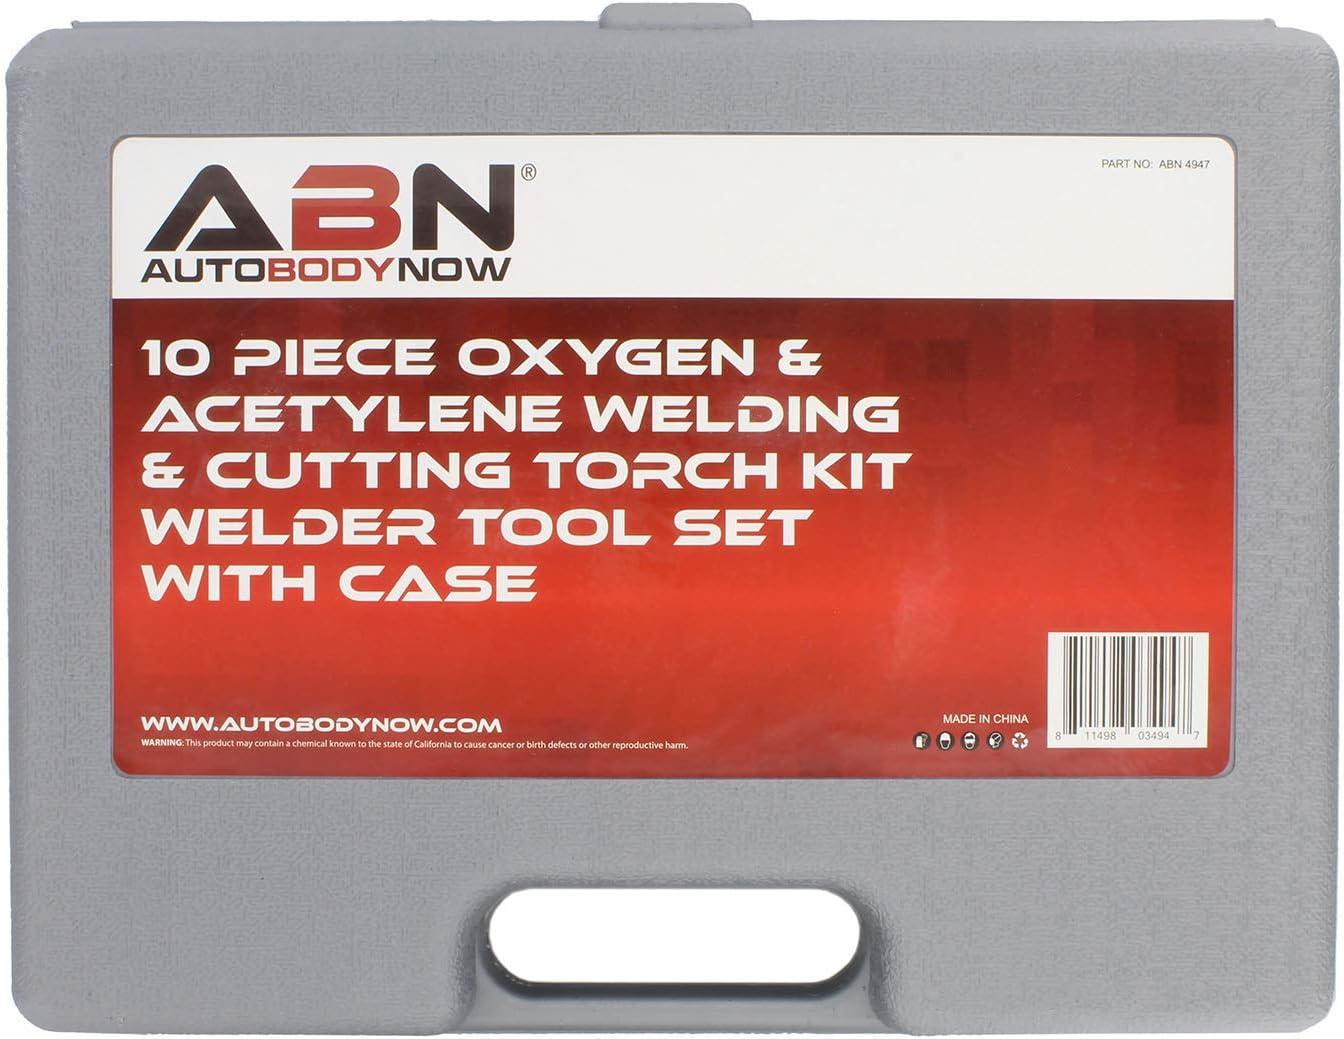 10 Pc Welding Kit Metal Cutting Torch Kit ABN/® Oxygen /& Acetylene Torch Kit Portable Cutting Torch Set Welder Tools